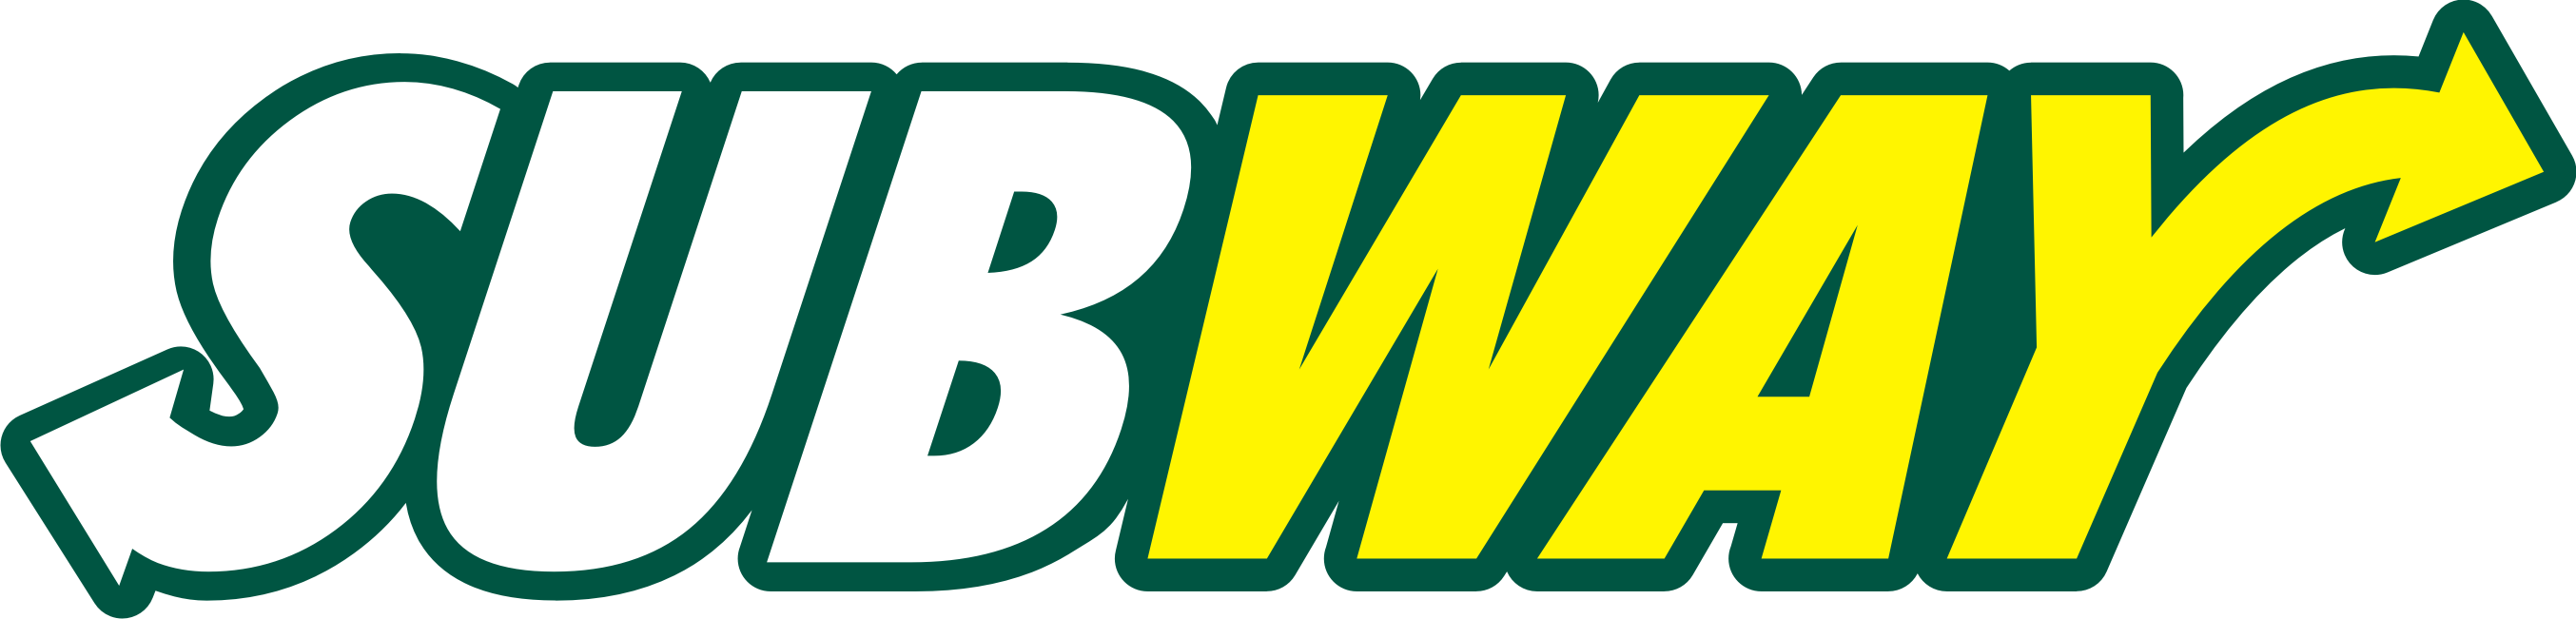 2708x651 Subway Logo Design Vector Free Download